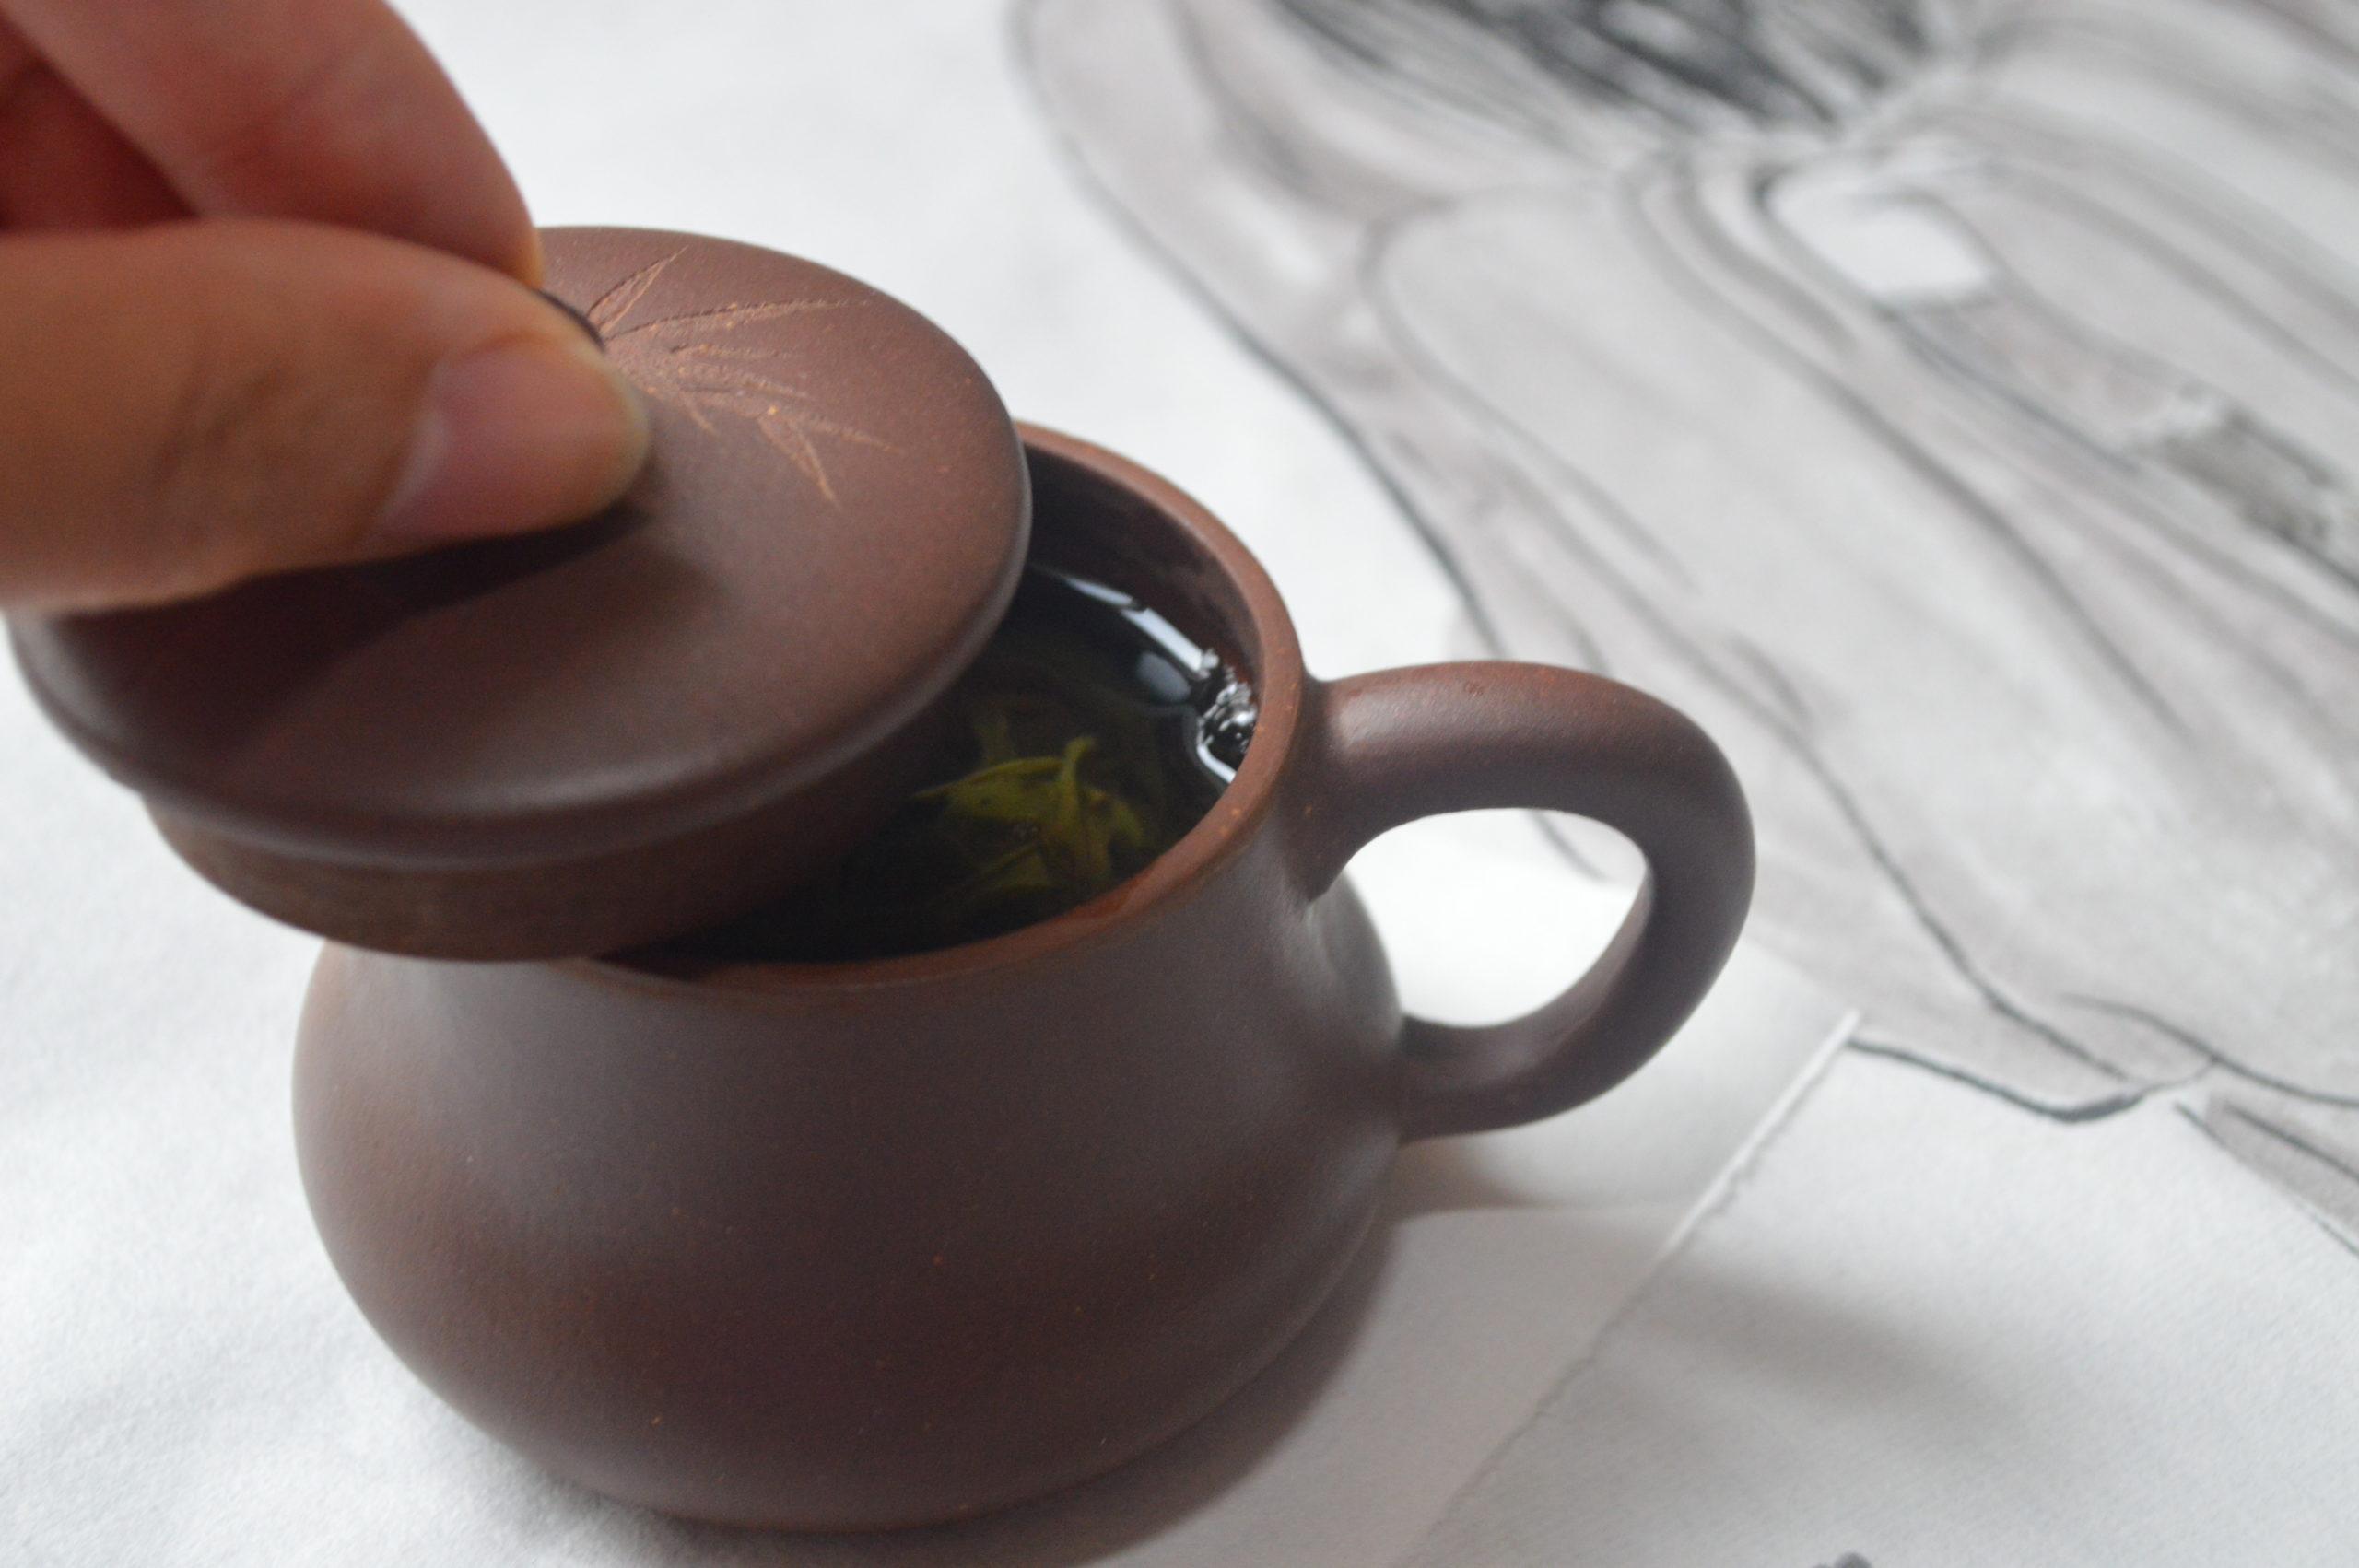 https://shop.liu-tea-art.com/wp-content/uploads/2020/08/DSC_0066-scaled.jpg